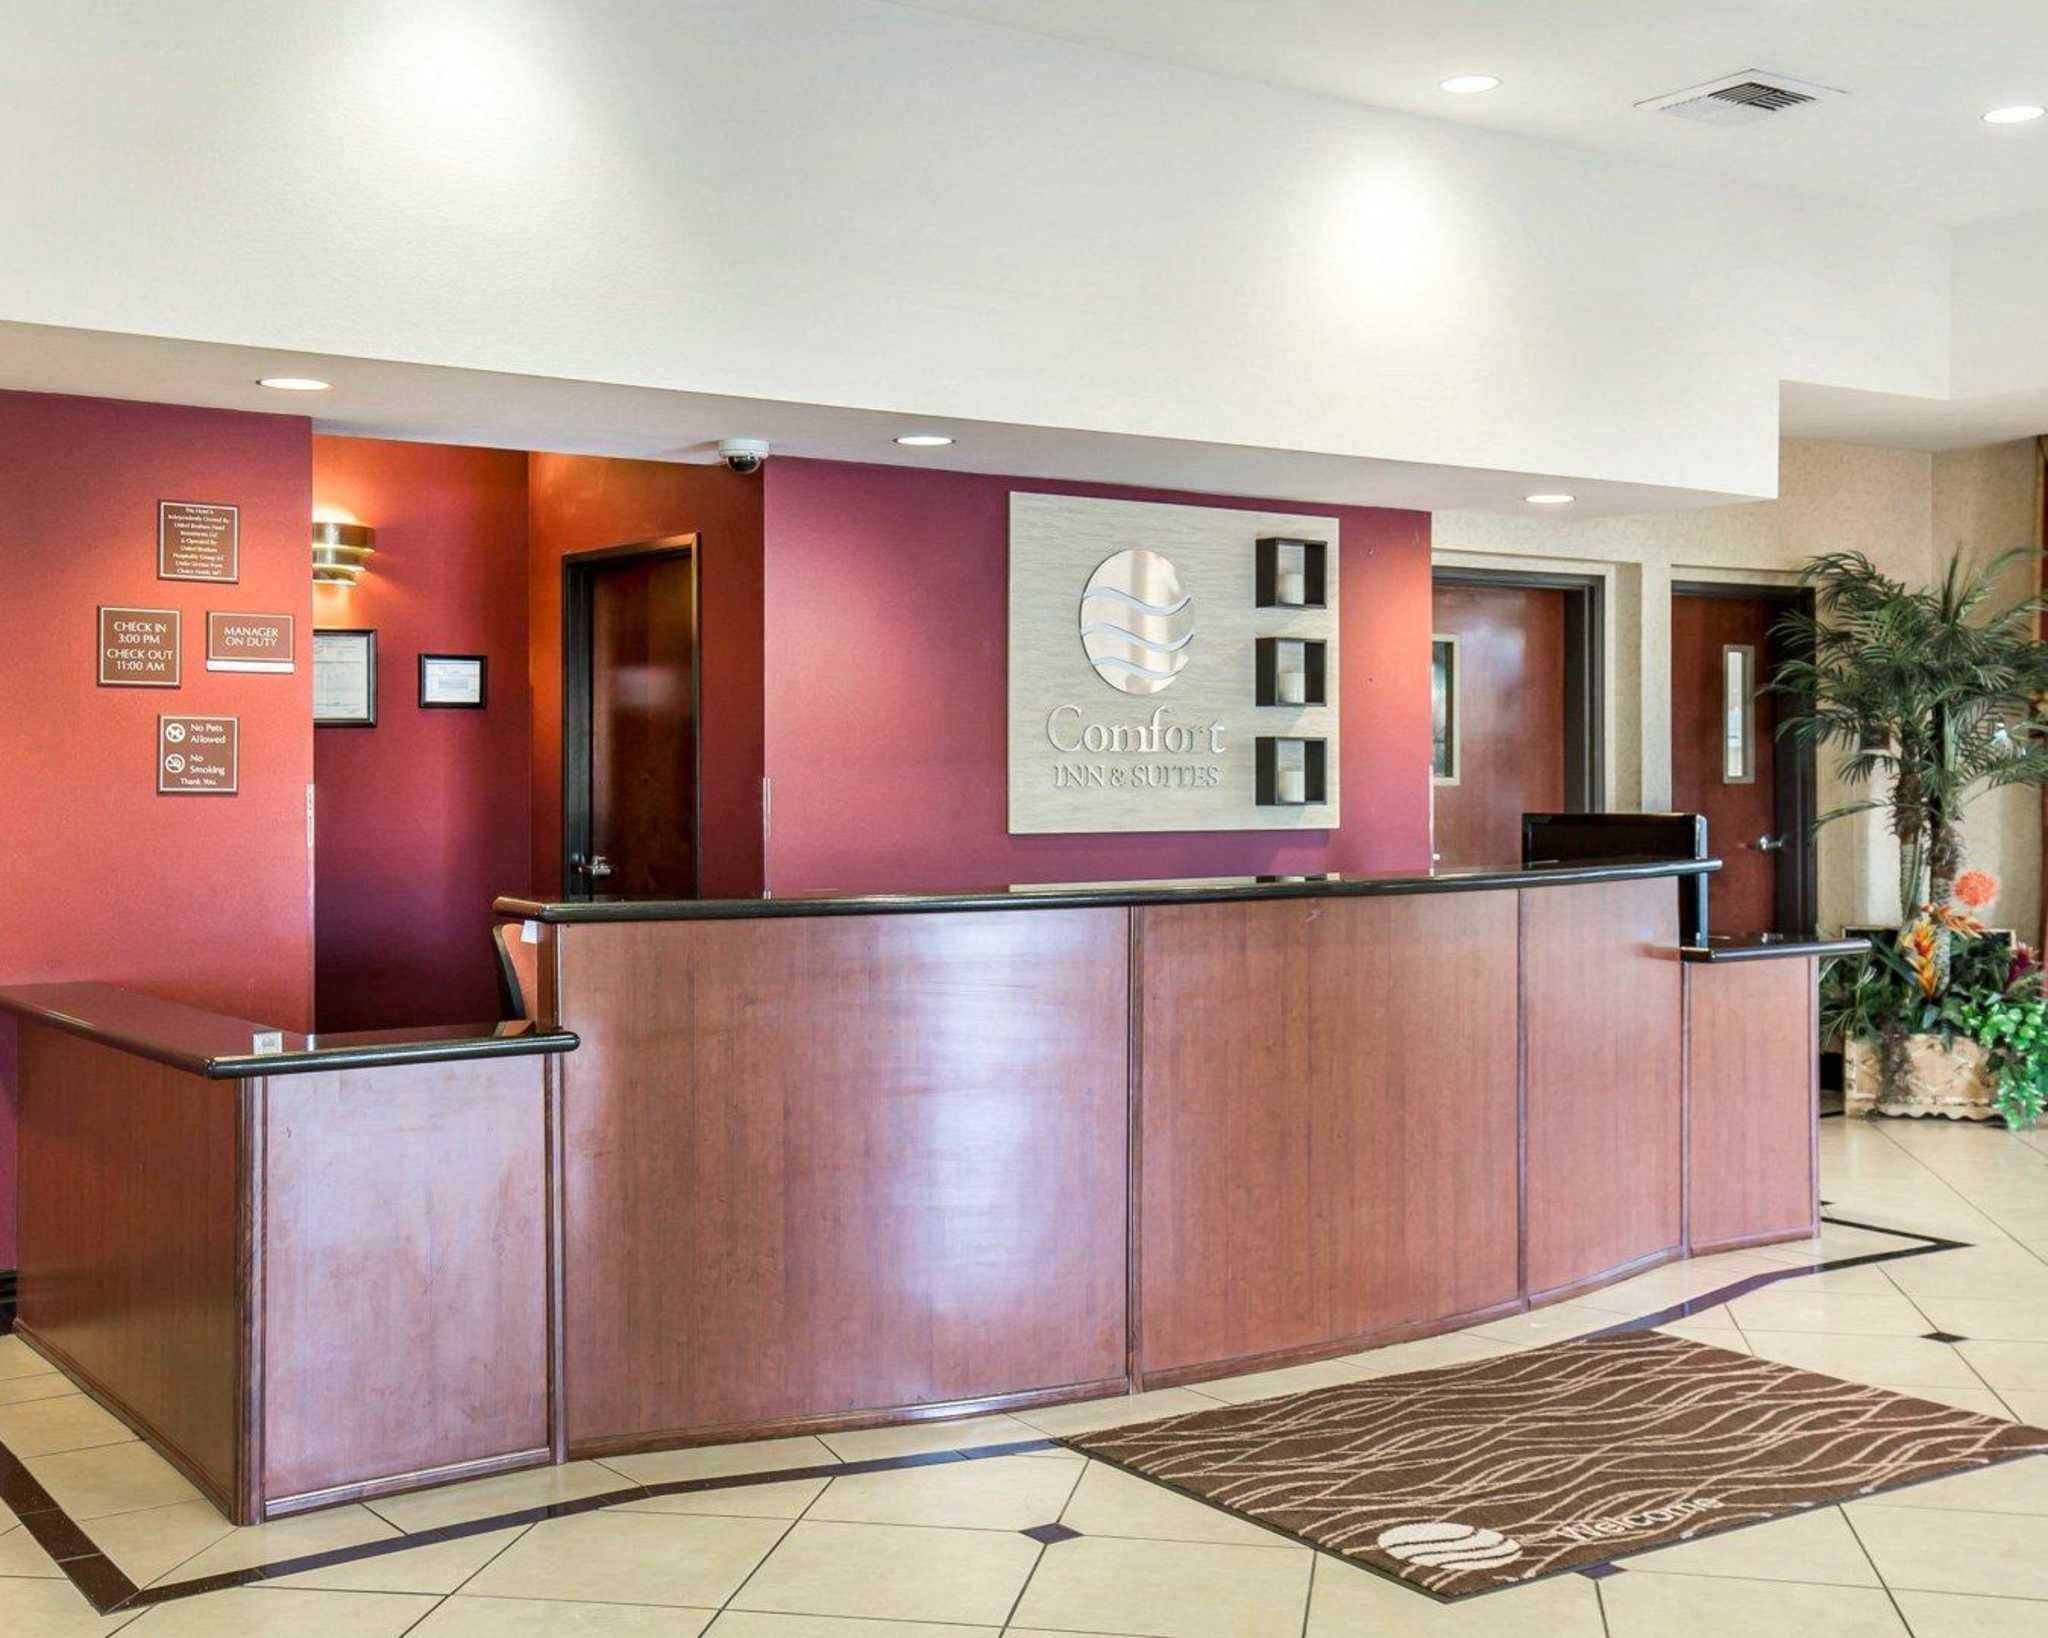 Comfort Inn & Suites Las Vegas - Nellis image 2